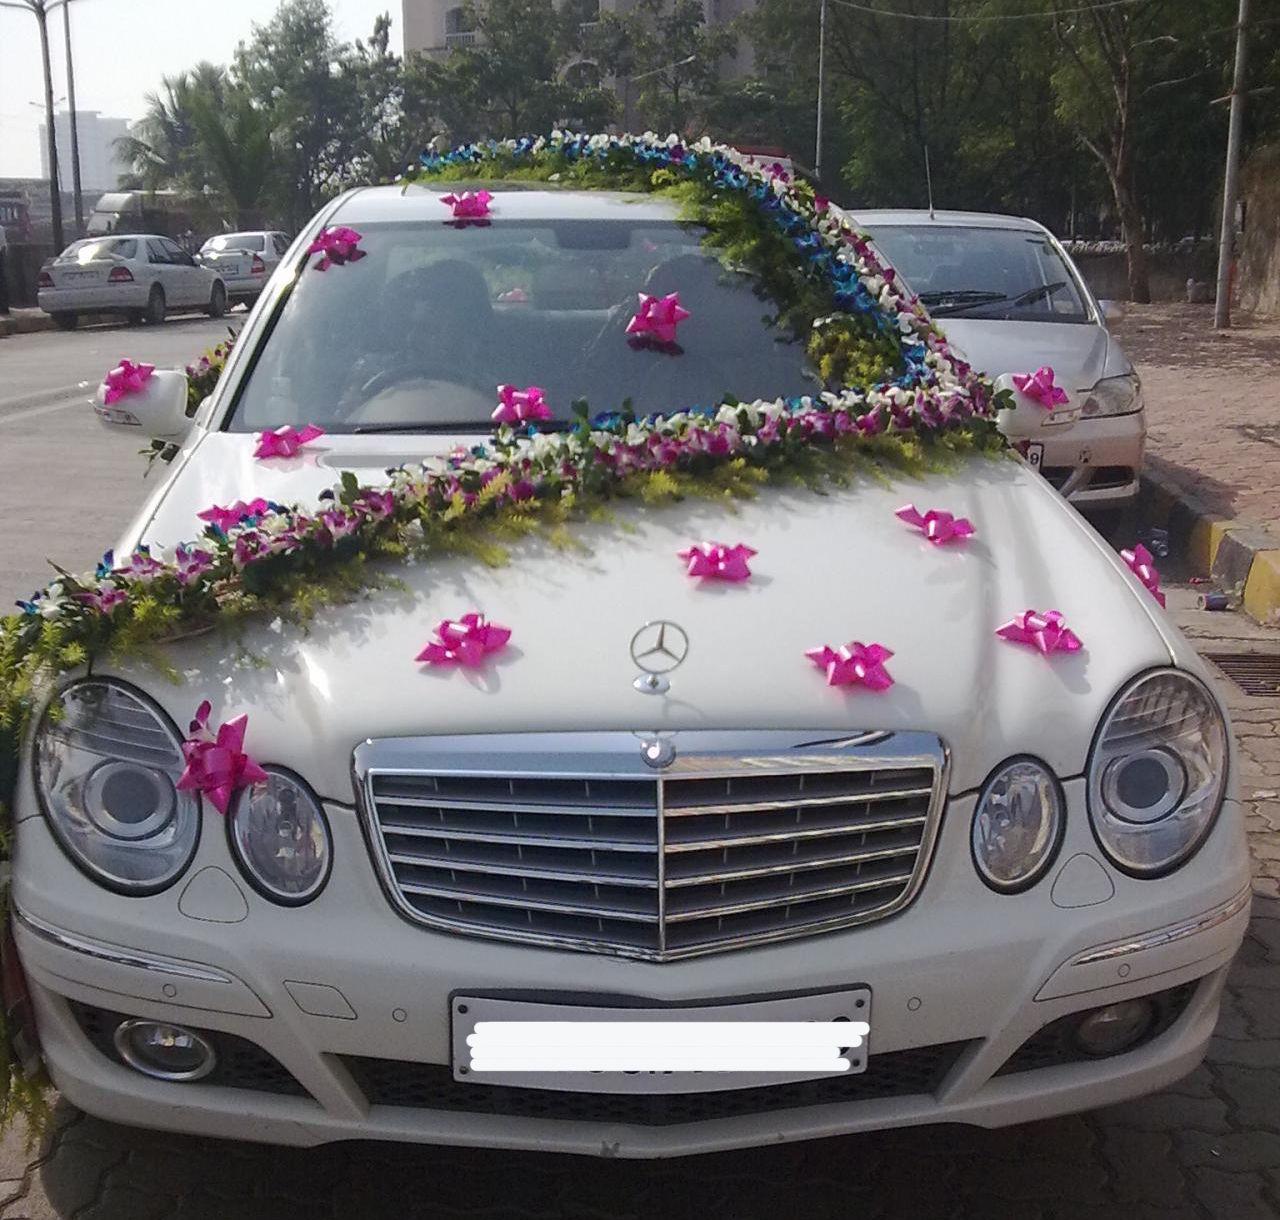 Http Www Weddingcarhiredelhi In Volvo Coaches Html 35 Seater Ac Coaches 25 Seater Ac Coaches Merced Wedding Car Hire Wedding Car Wedding Car Decorations